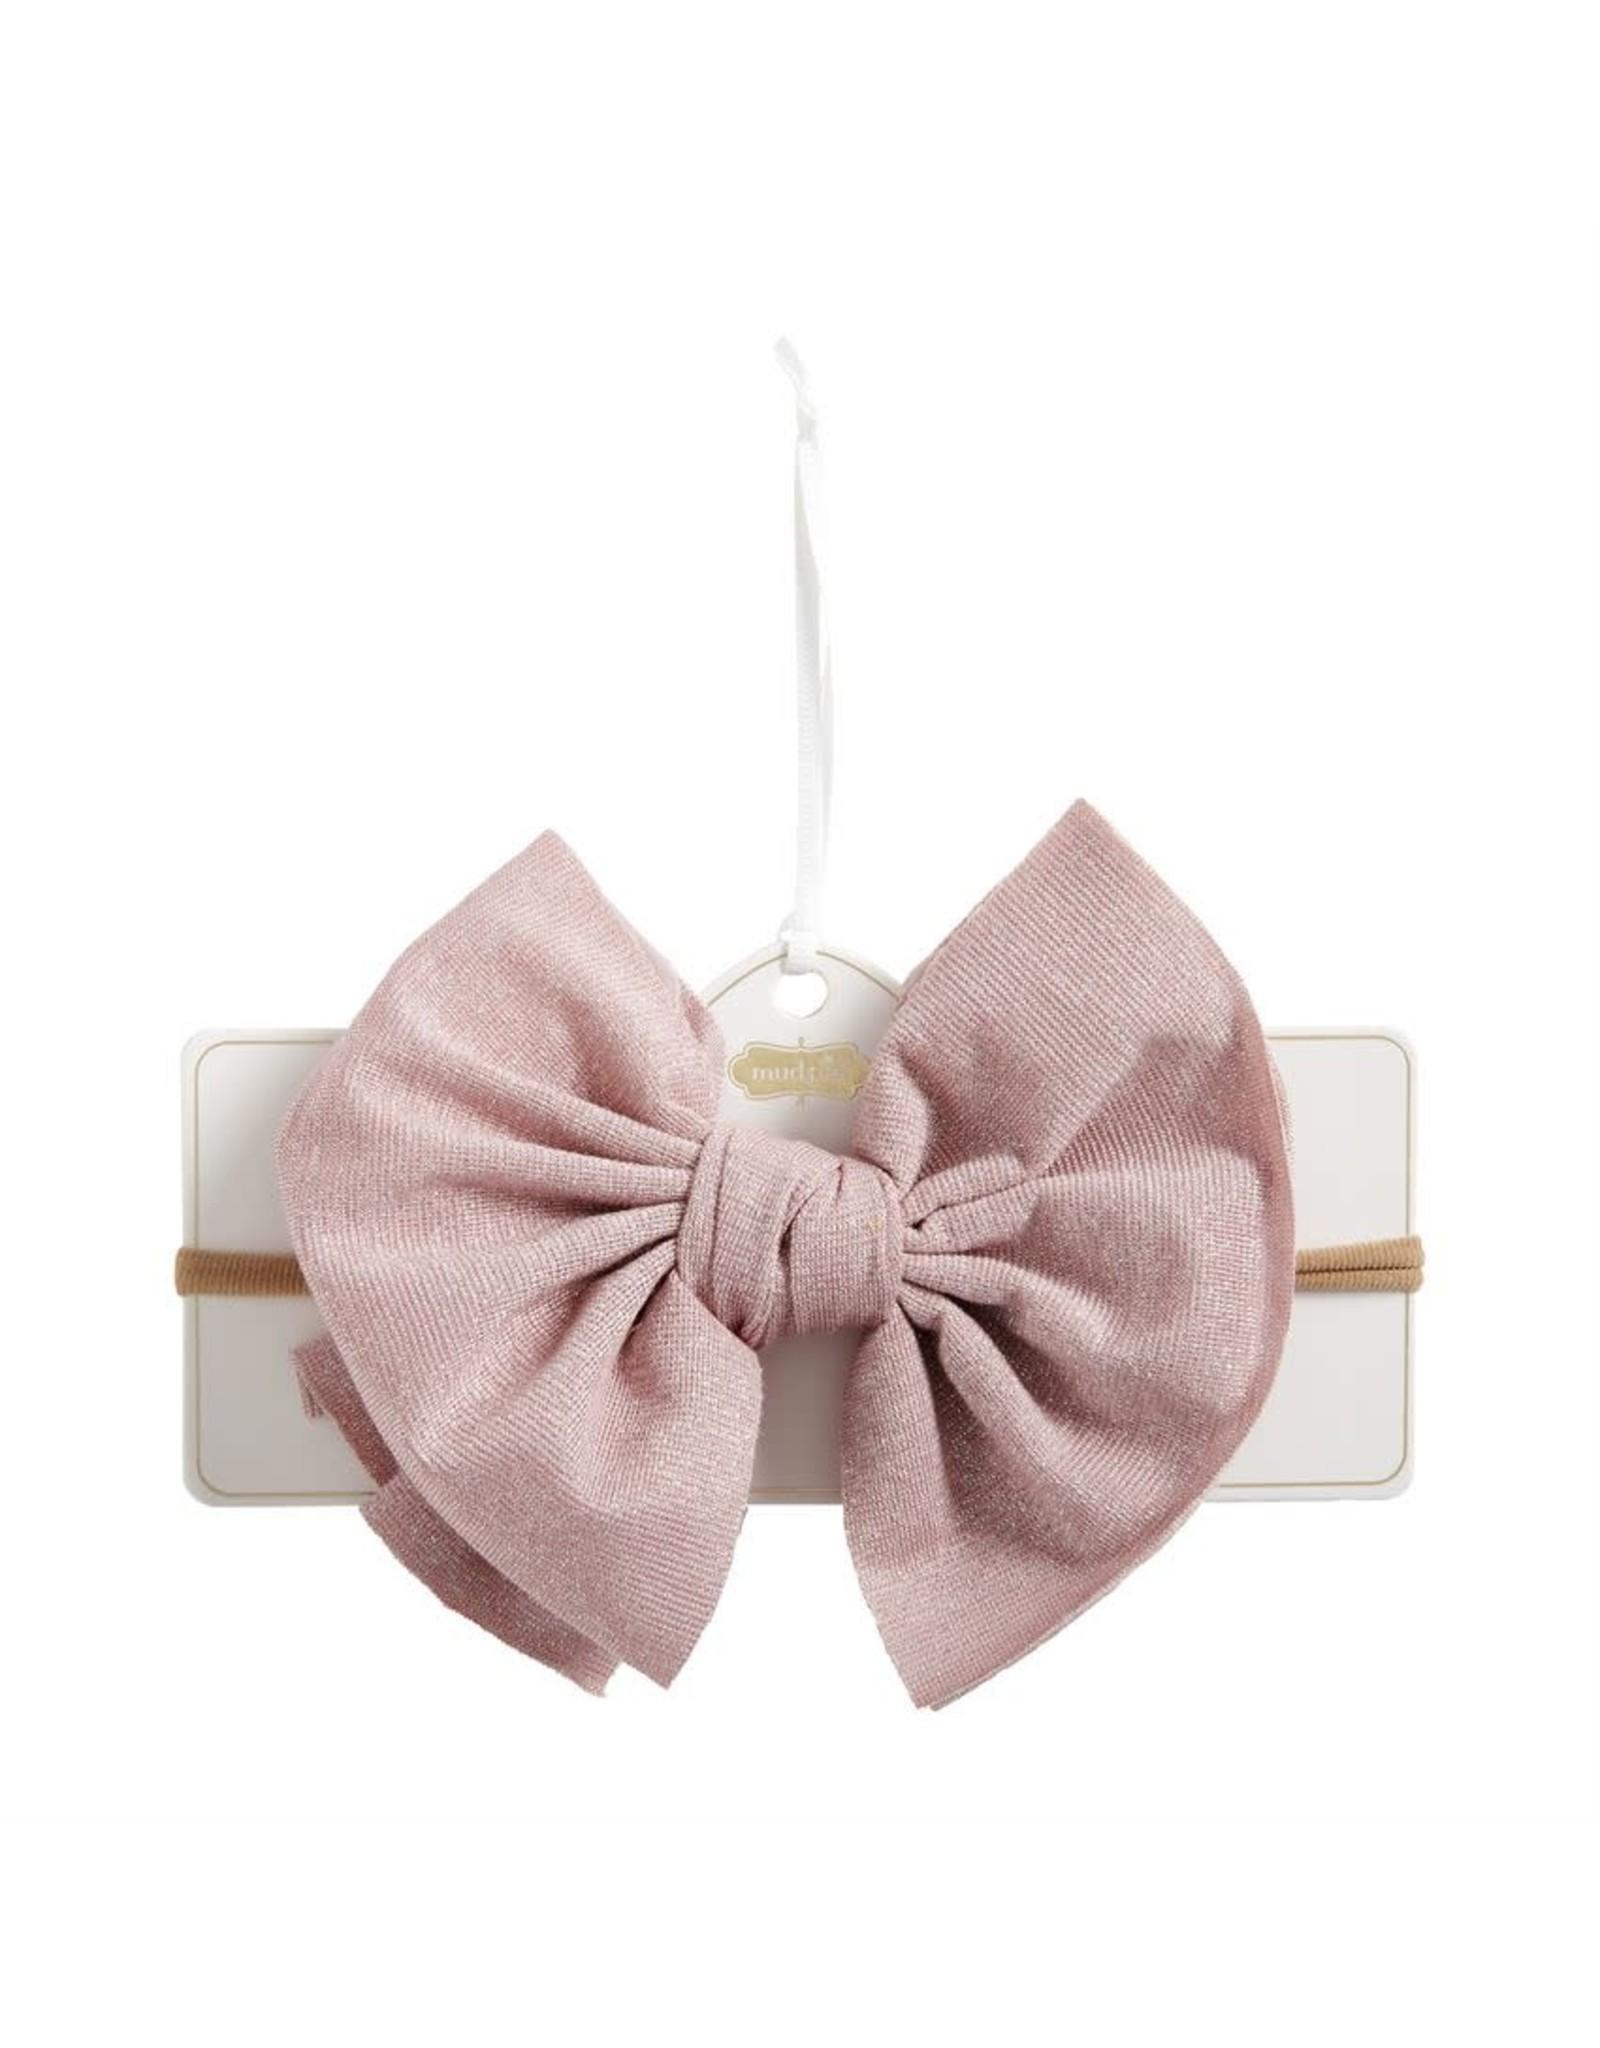 Mud Pie Baby N Kids Hair Accessories Shimmer Bow Headband Pink